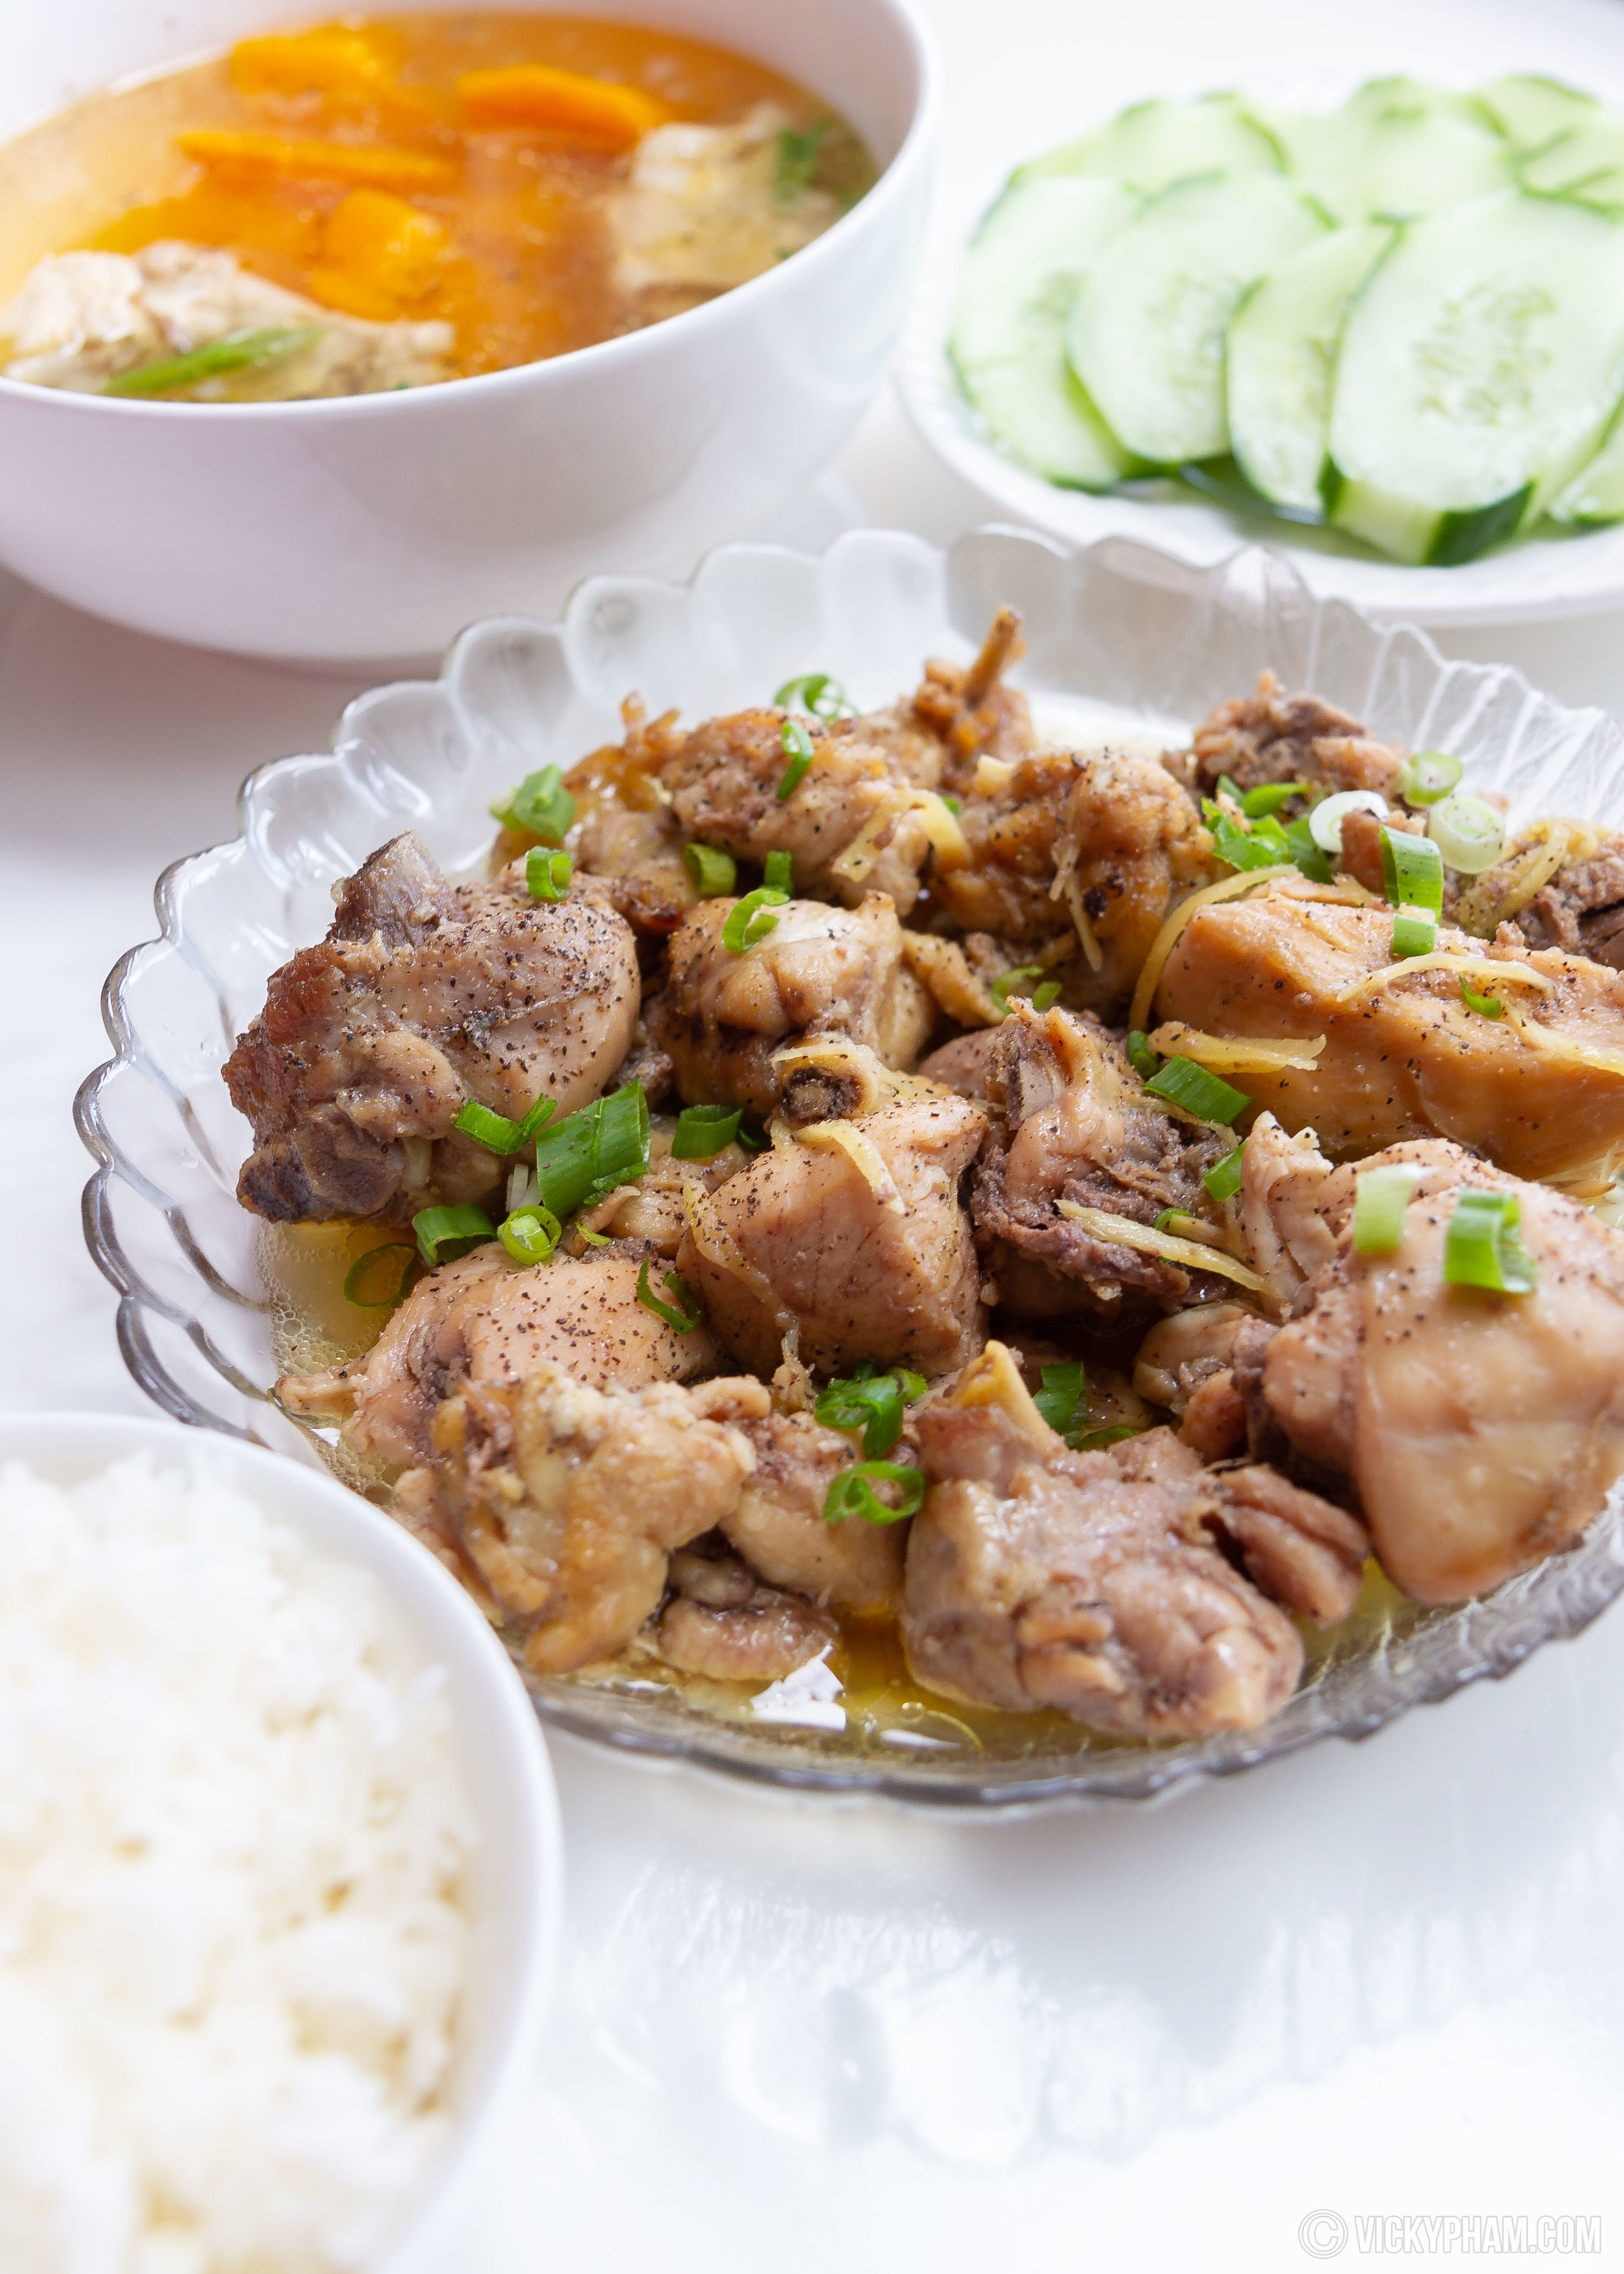 Vietnamese Caramelized Chicken with Ginger (Ga Kho Gung)